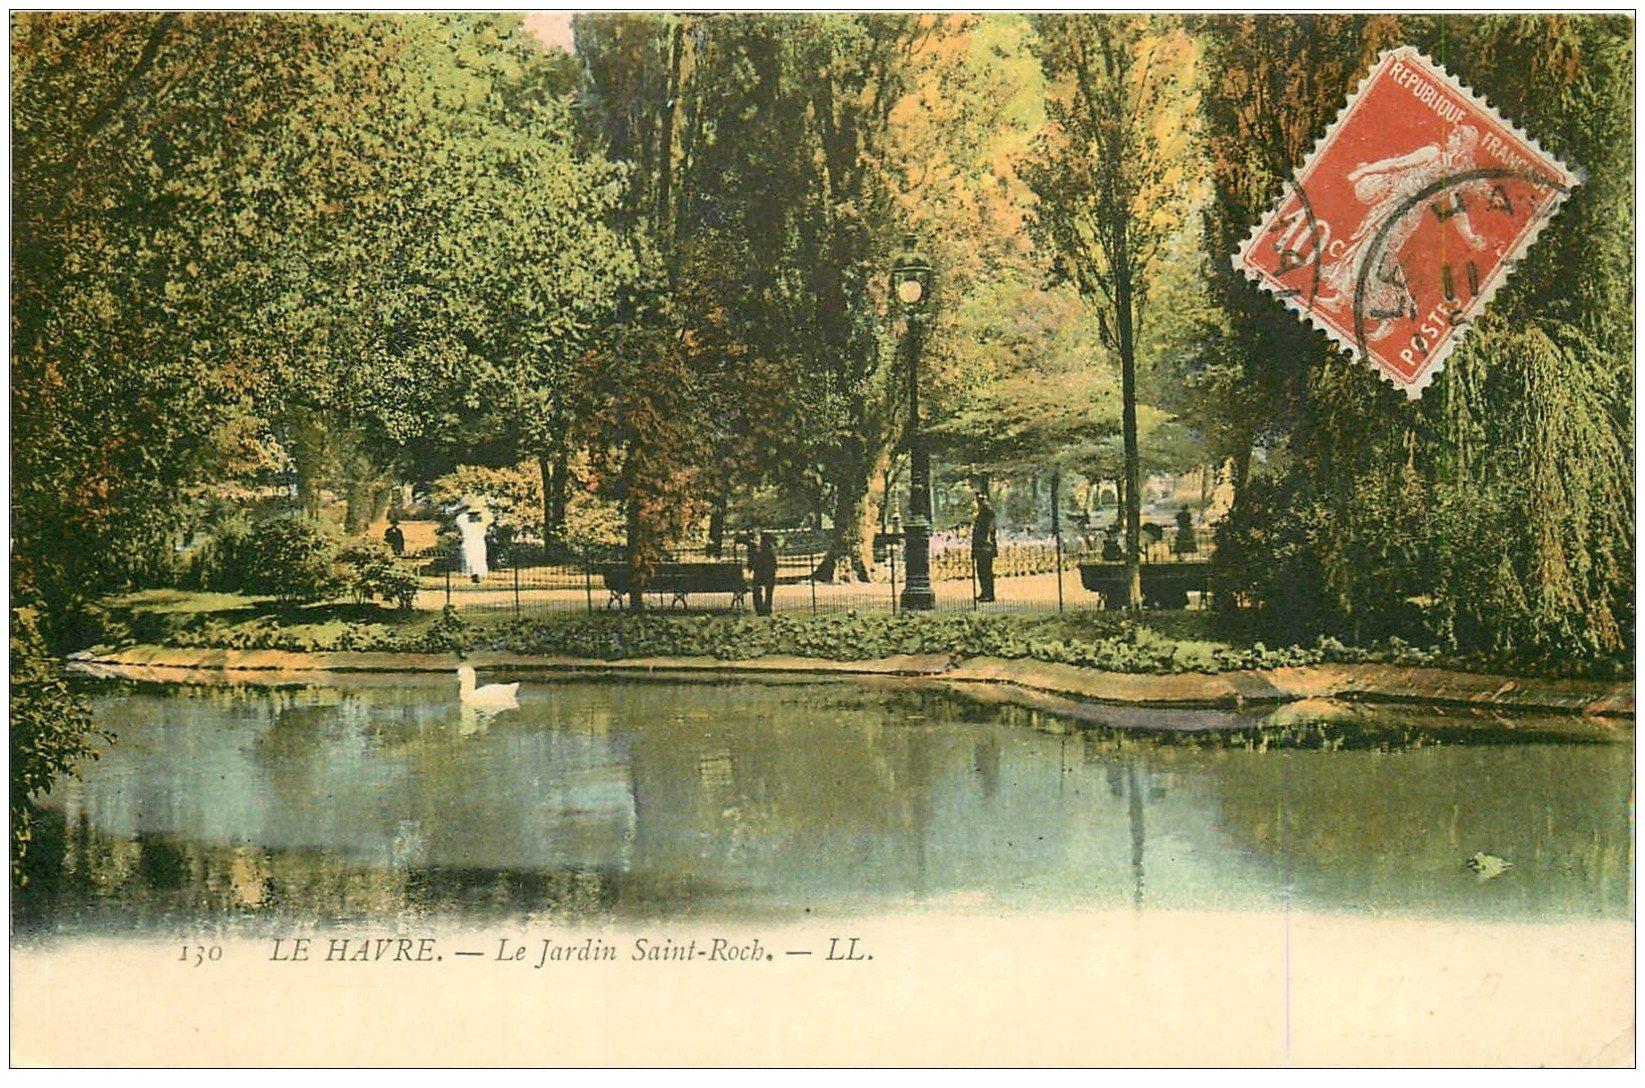 76 le havre jardin saint roch 1913 for Entretien jardin le havre